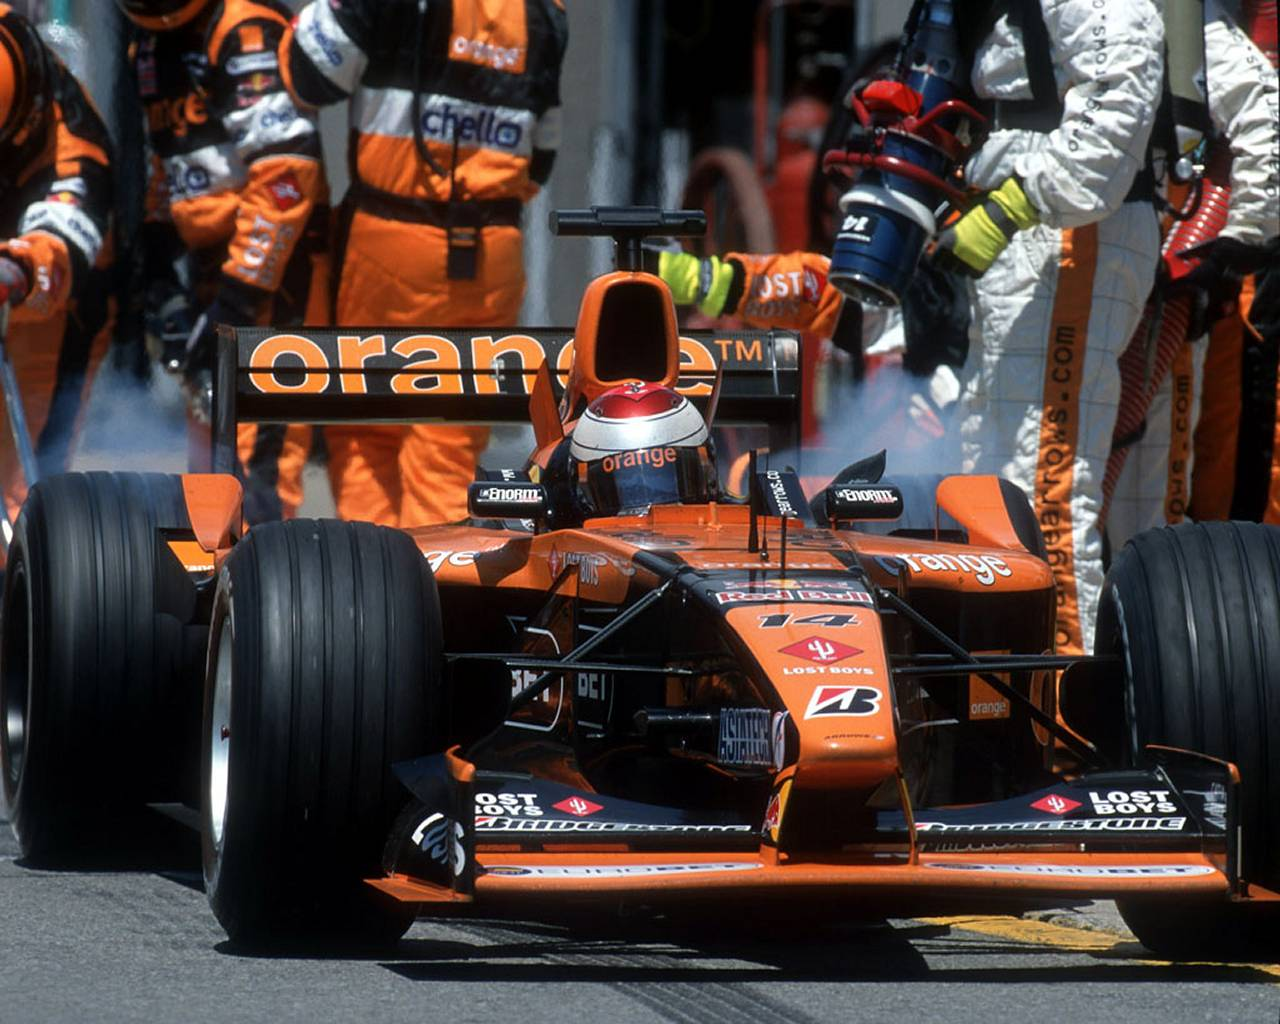 F1: The Demise of Arrows Grand Prix & TWR - essaar co uk